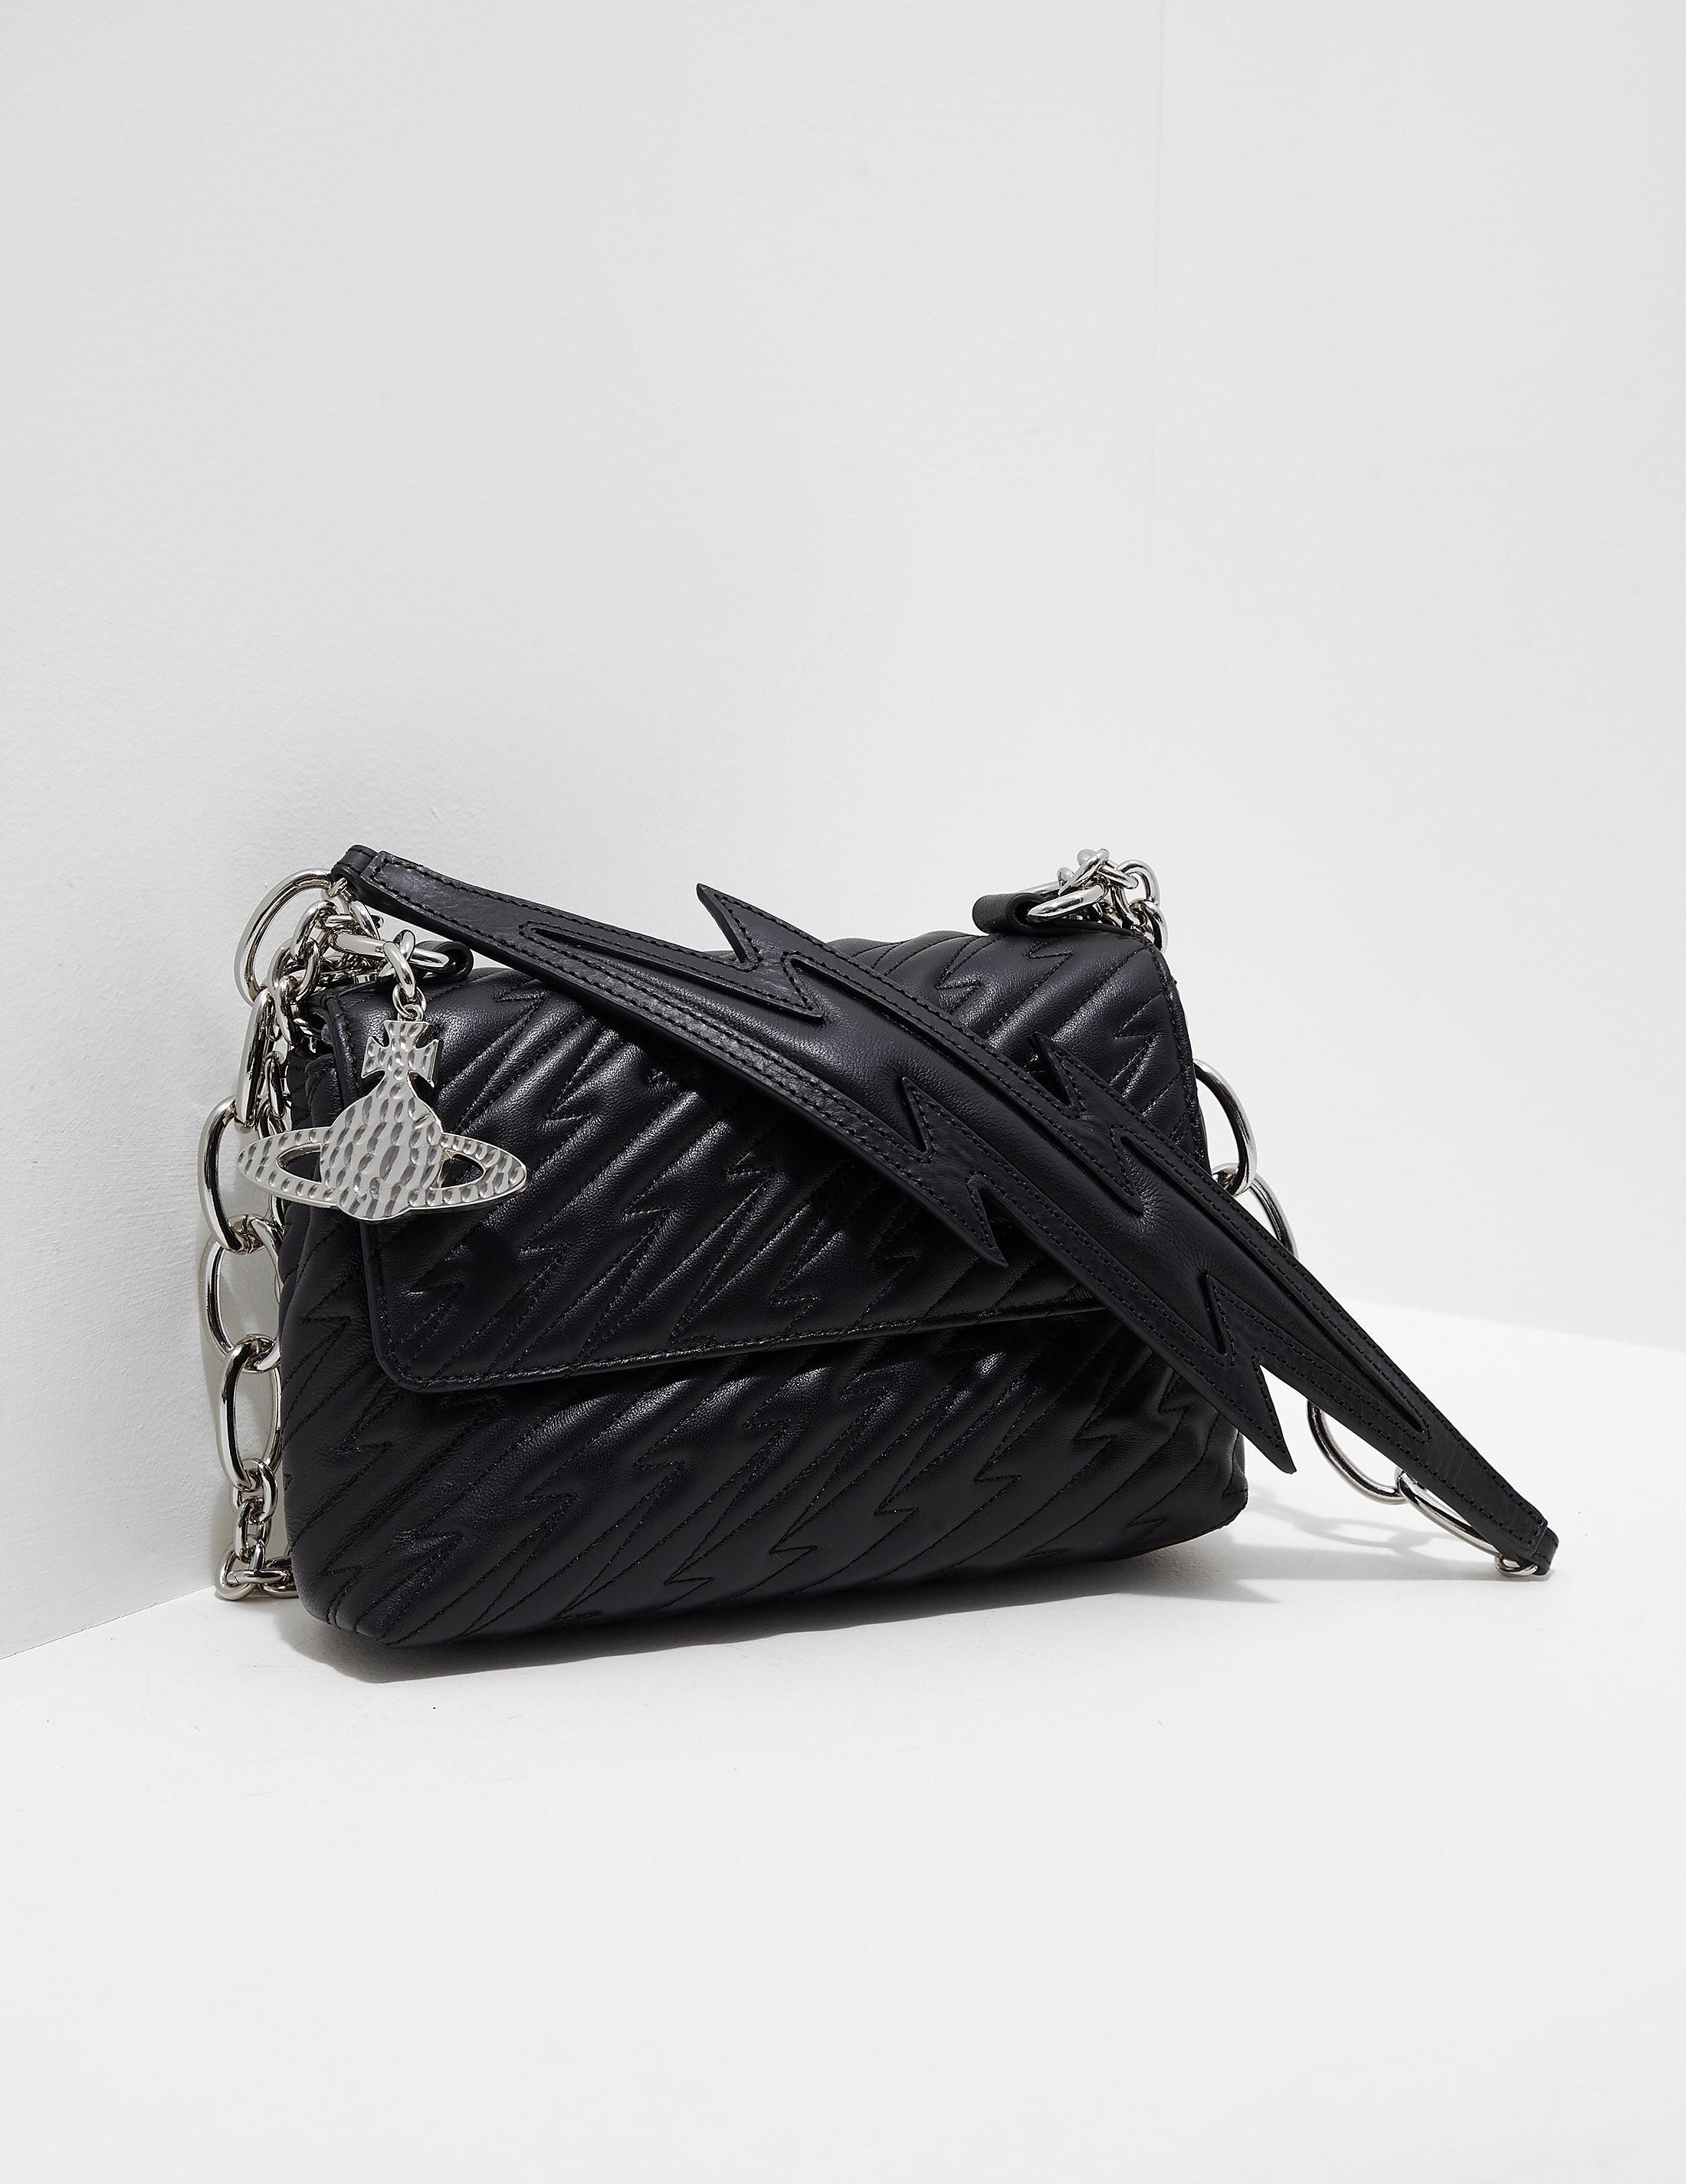 Vivienne Westwood Coventry Bolt Bag